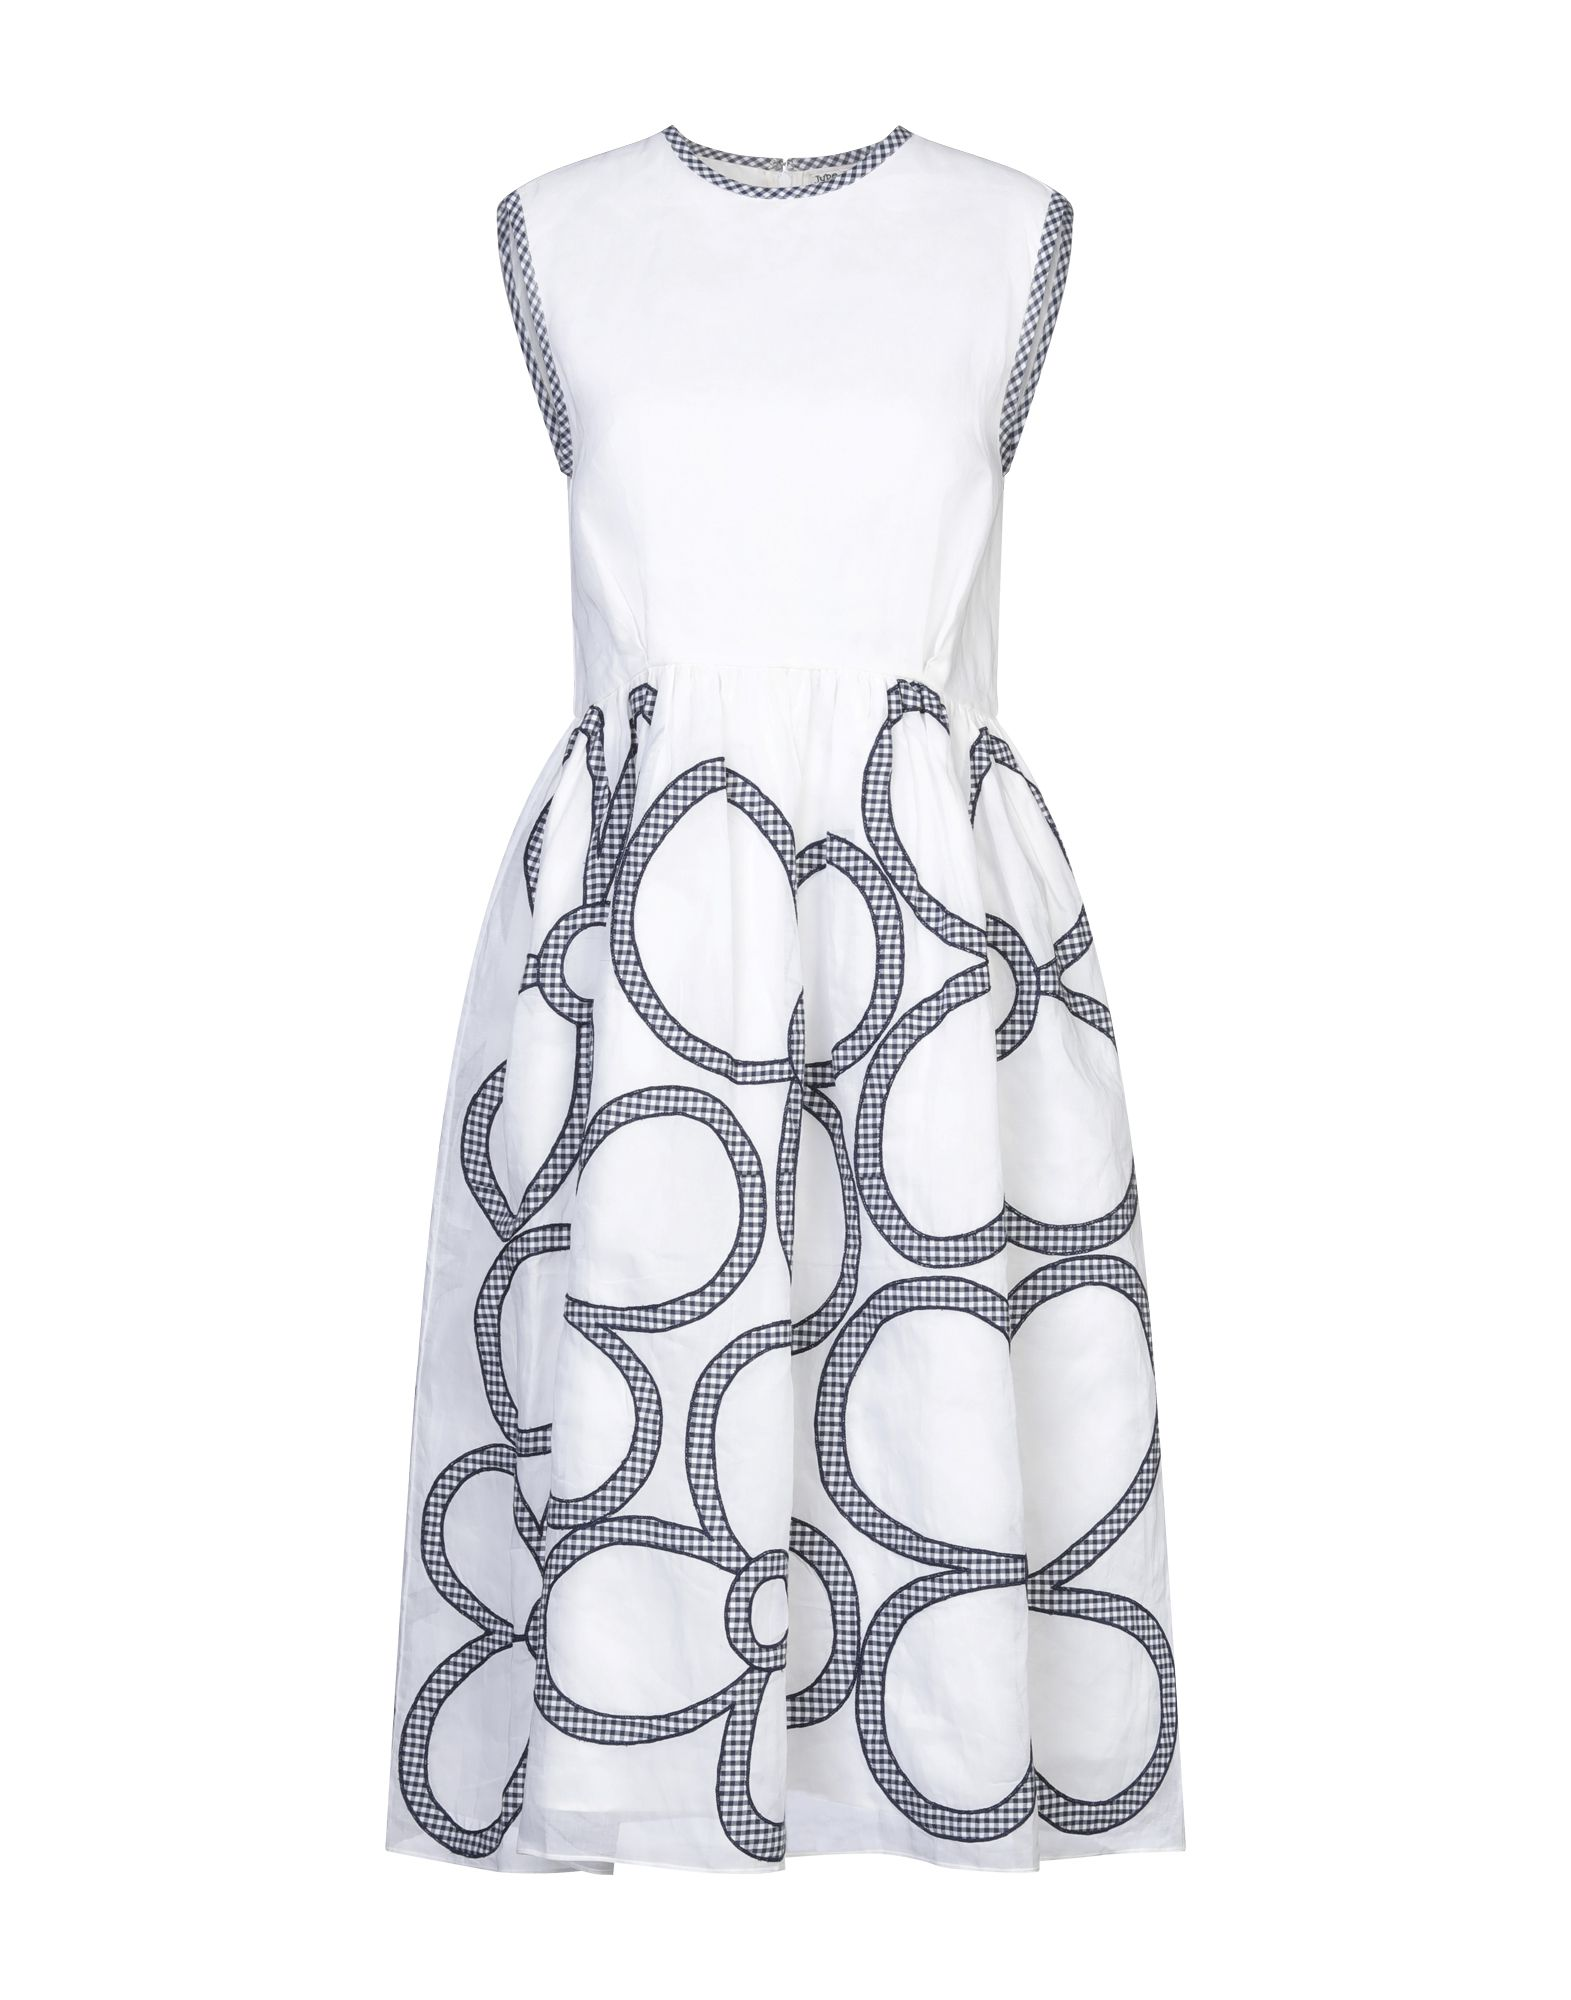 JUPE by JACKIE Платье длиной 3/4 jupe by jackie хлопковые брюки